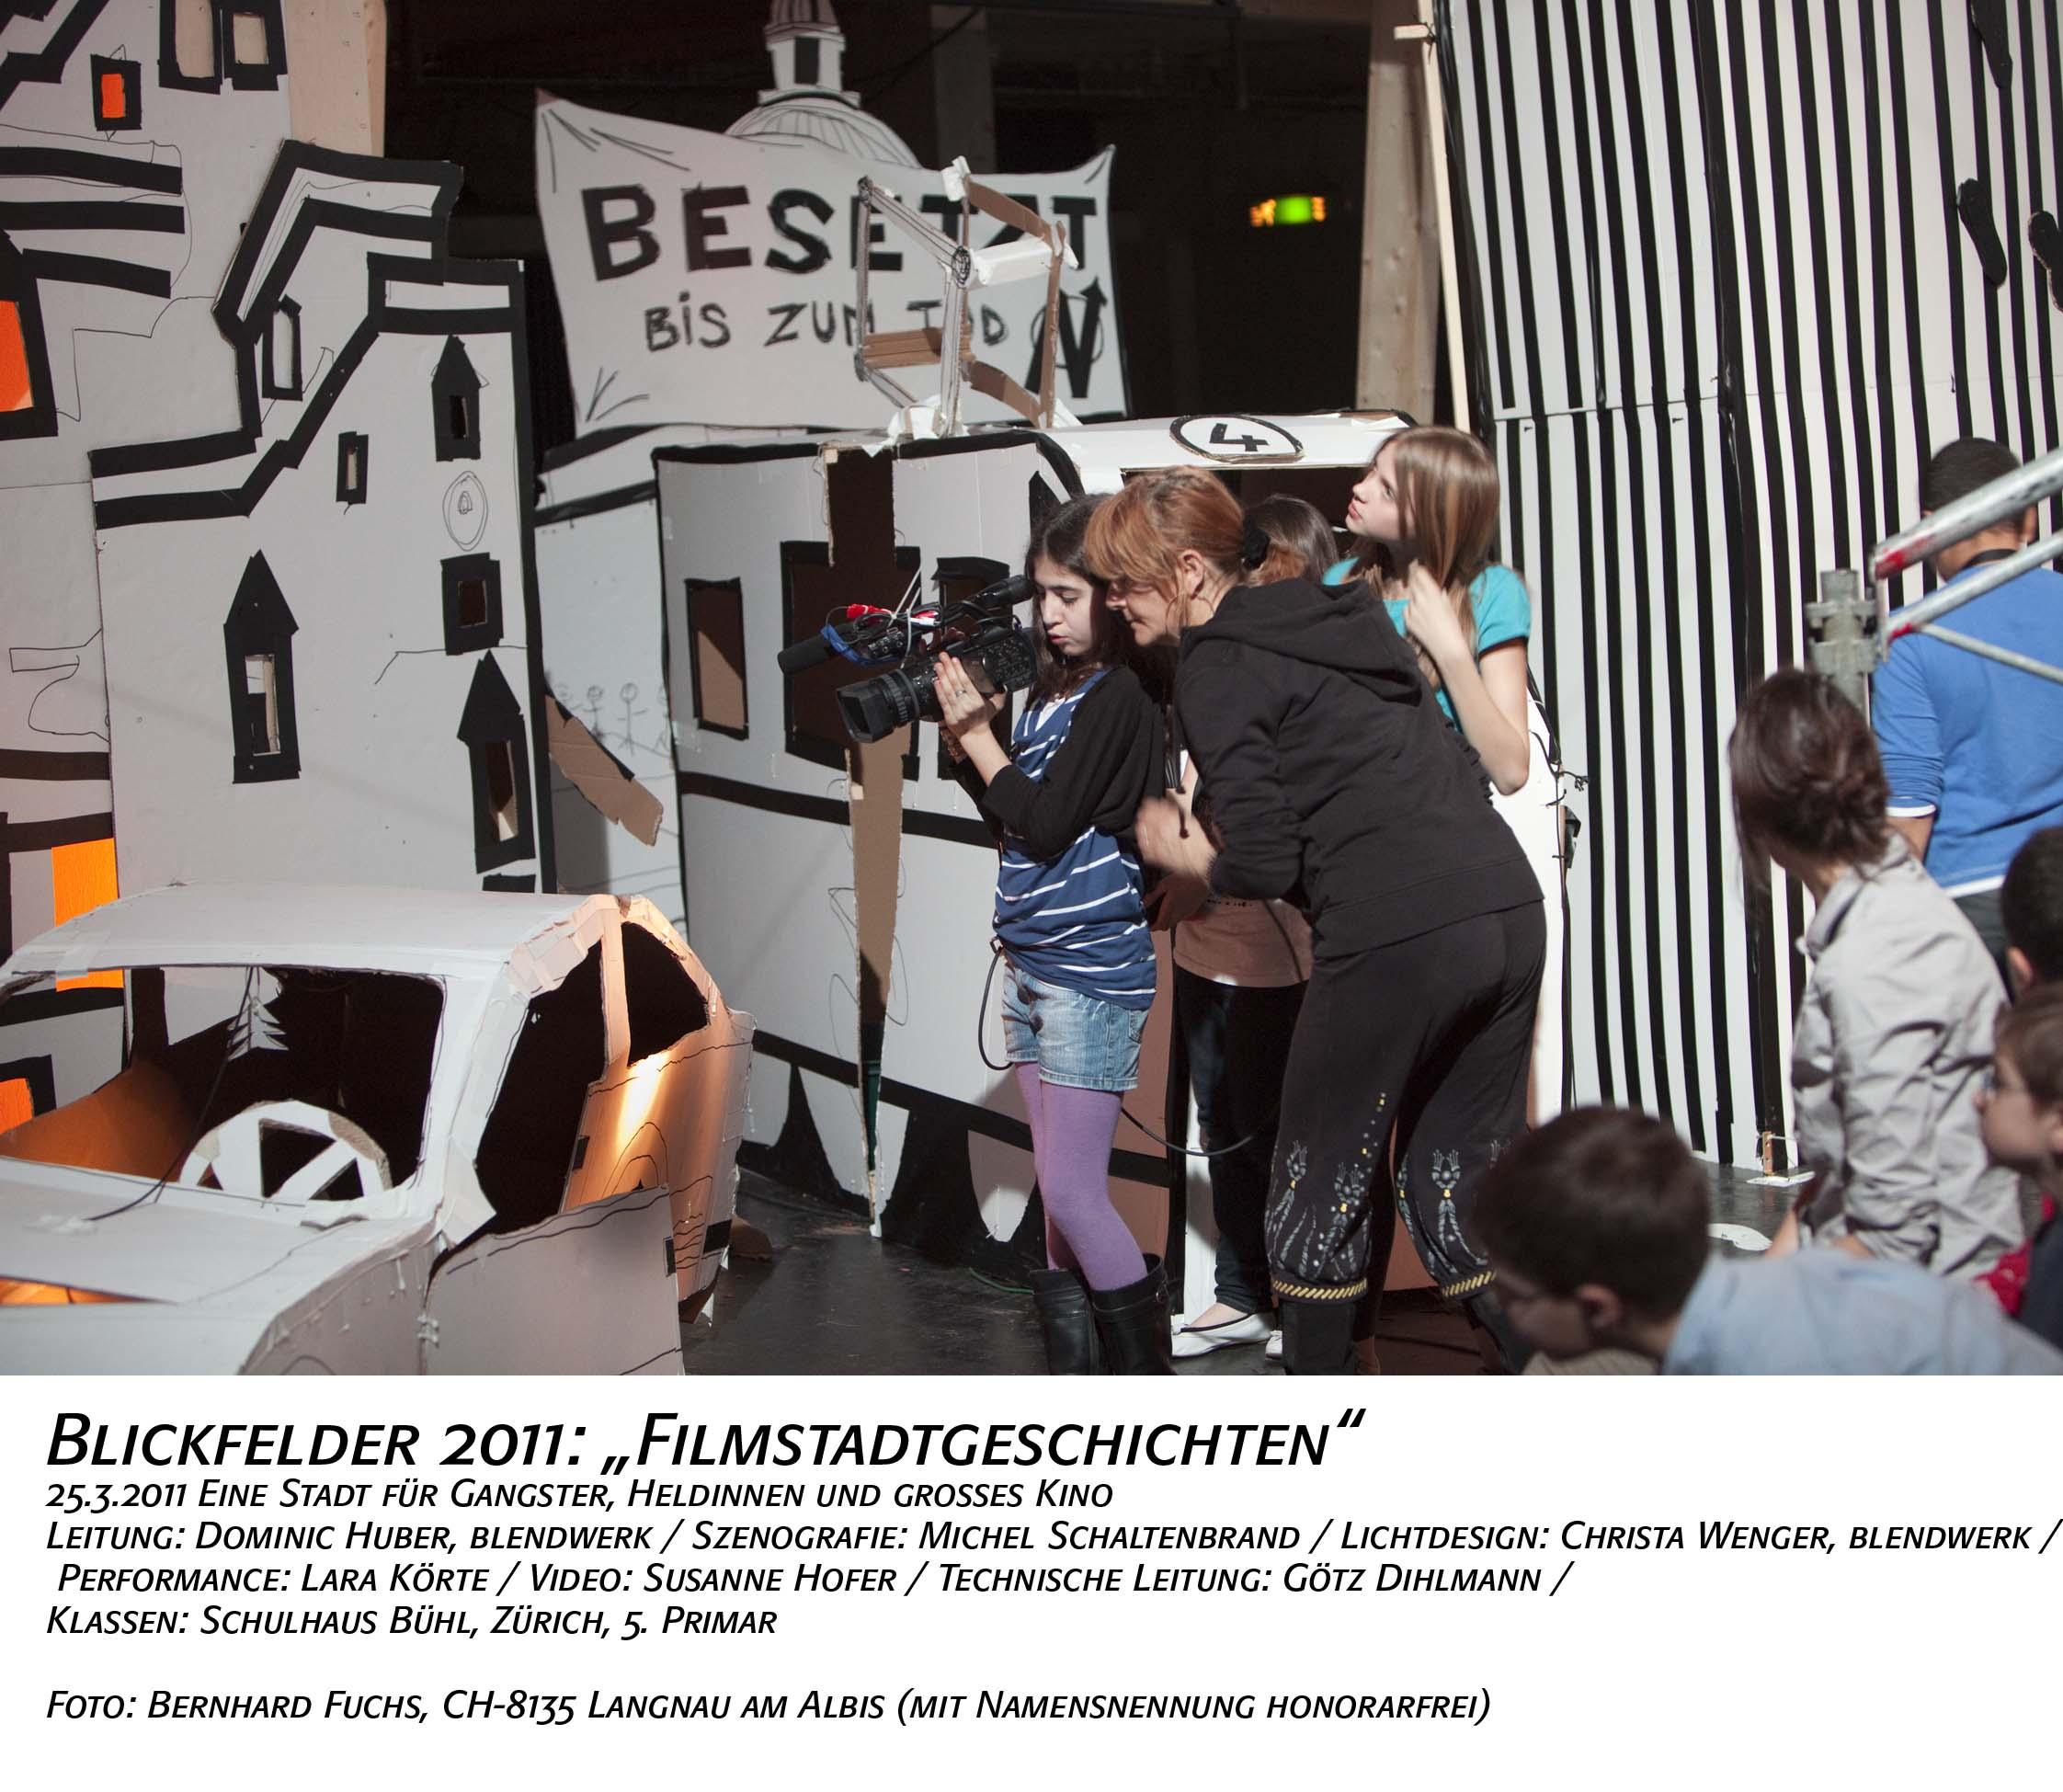 Filmstadtgeschichten-08.jpg